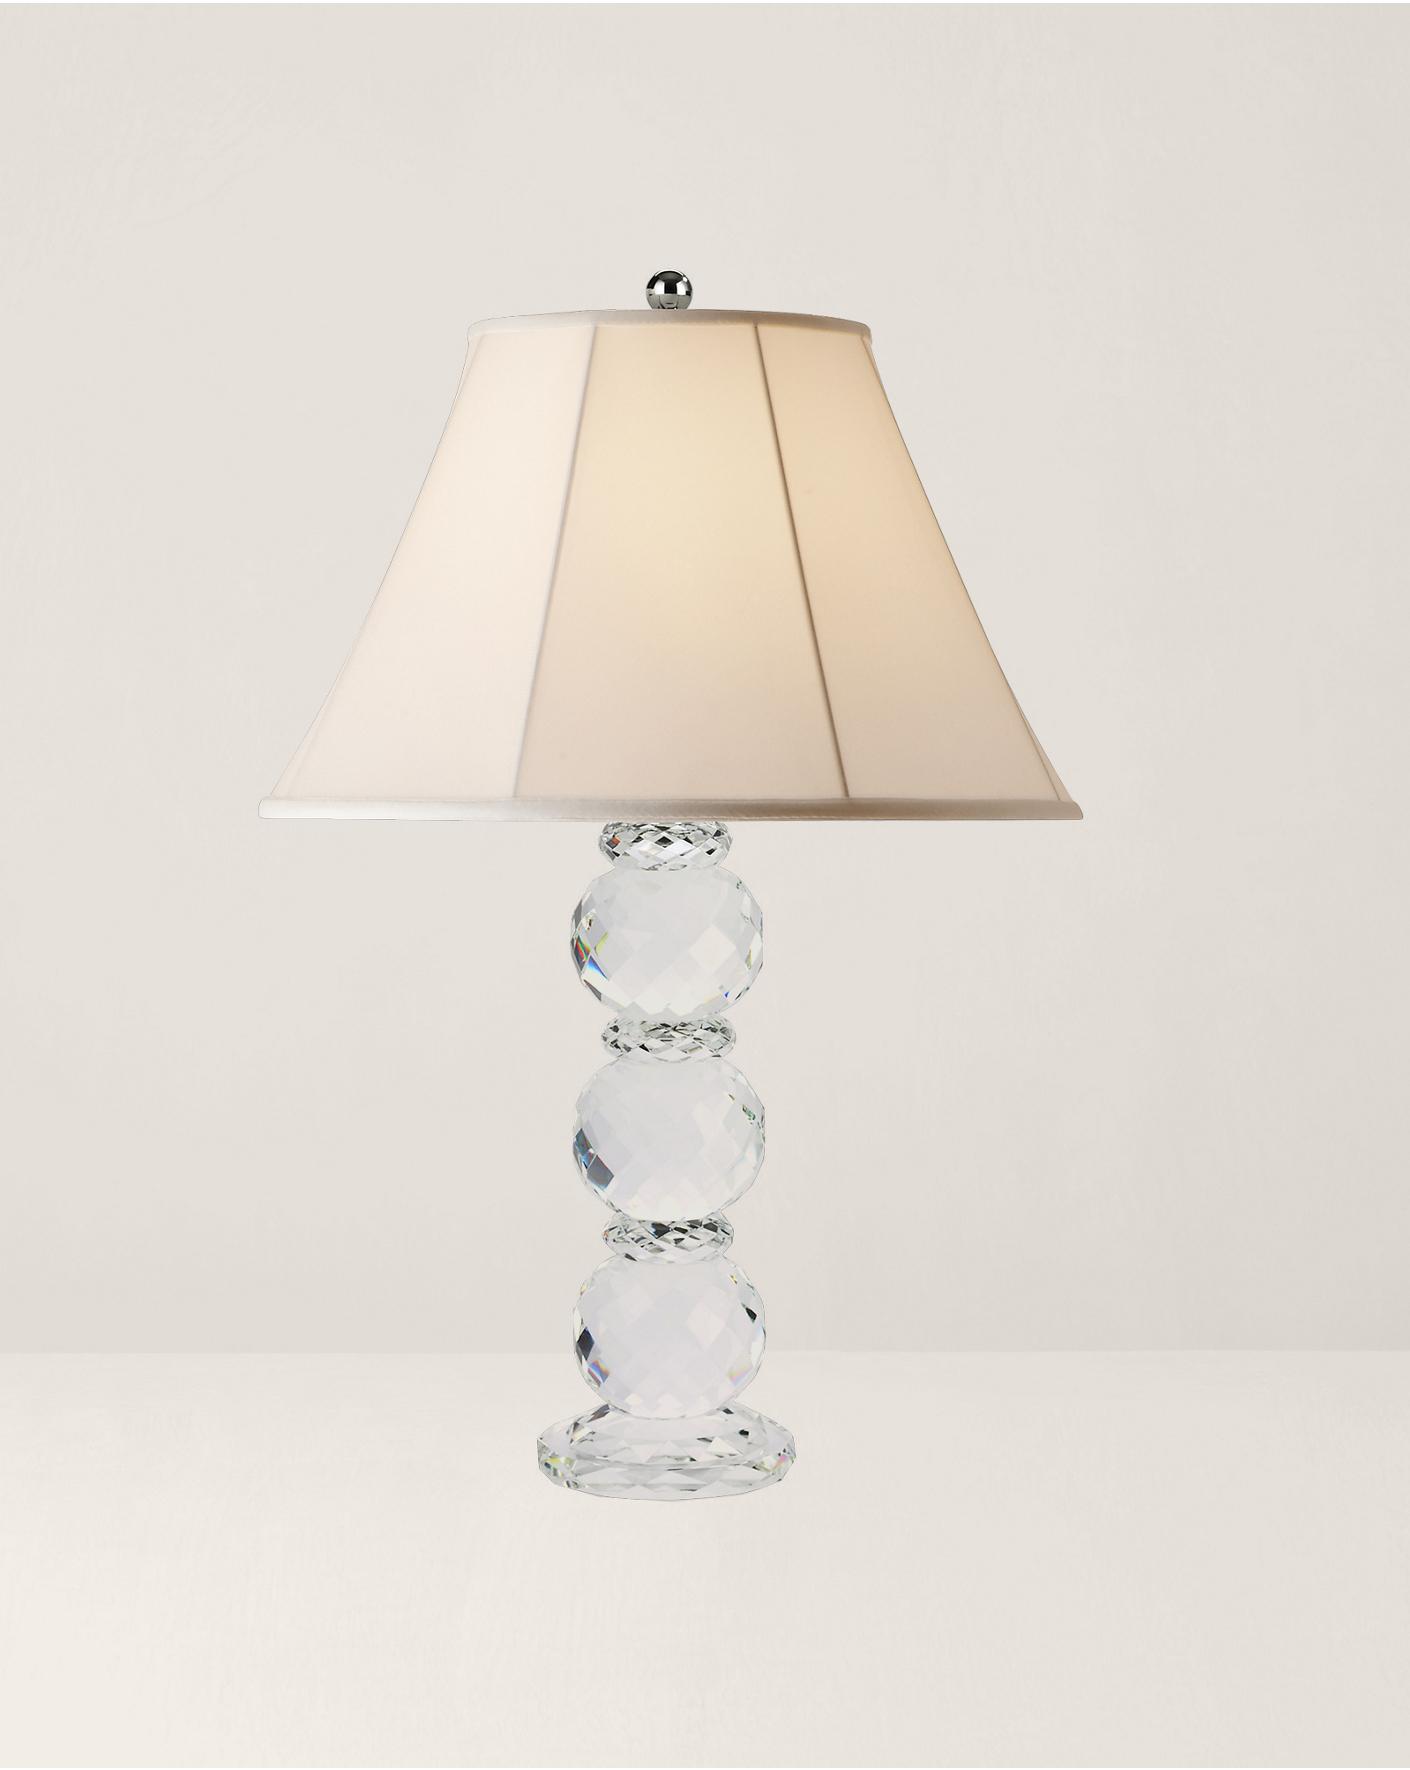 contemporary table desk  accent lamps  ralph lauren - faceted crystal lamp  ralph lauren home table lamps  ralphlaurencom